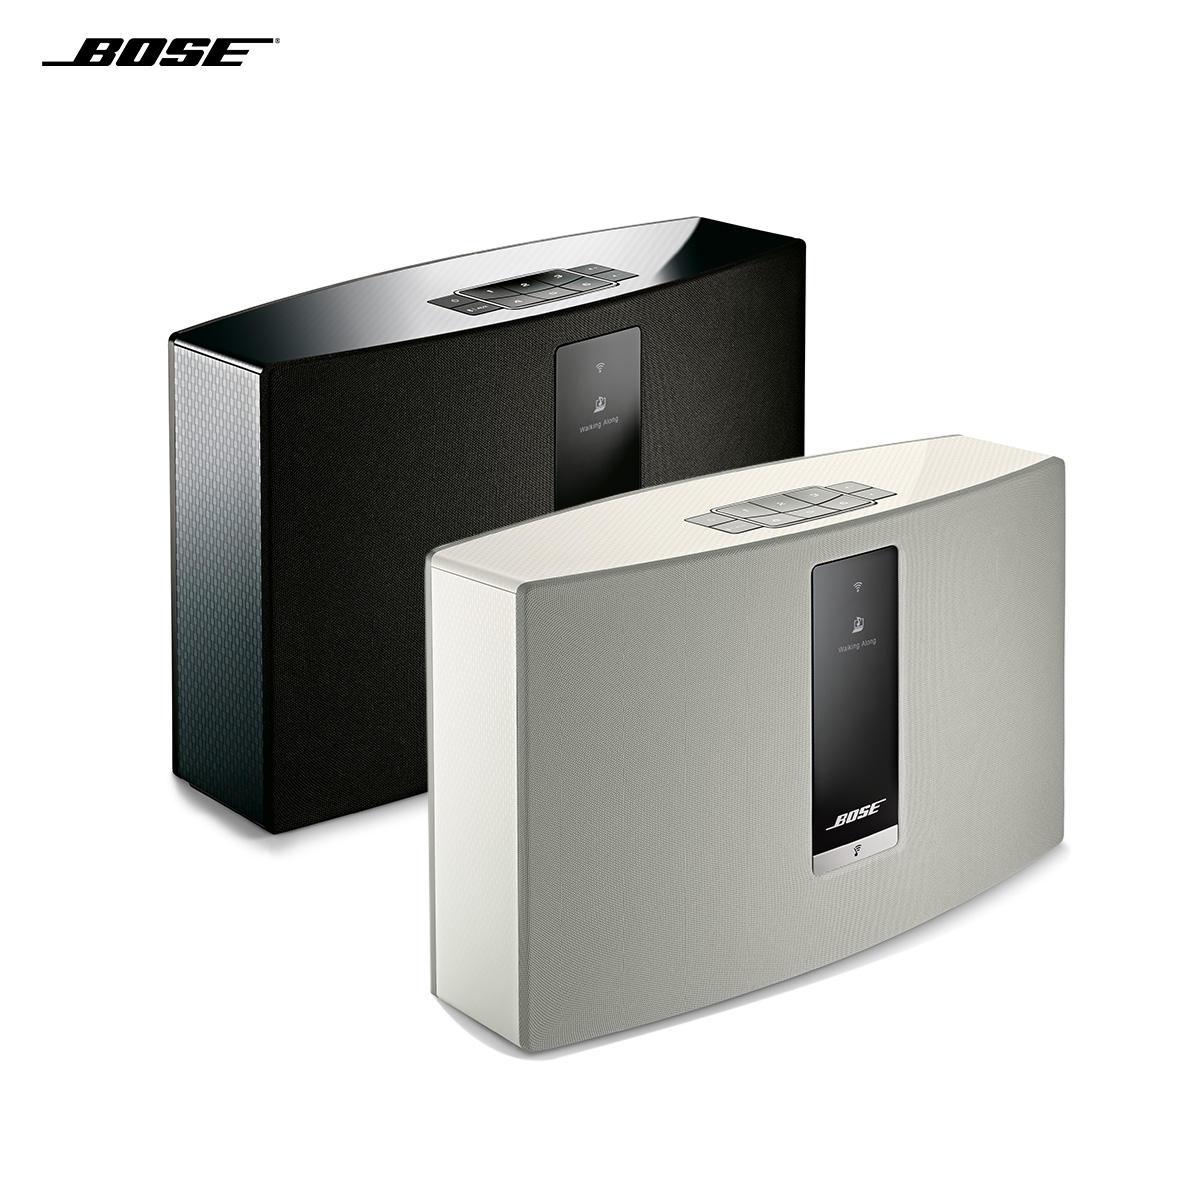 soundtouch 30 schaliestore. Black Bedroom Furniture Sets. Home Design Ideas